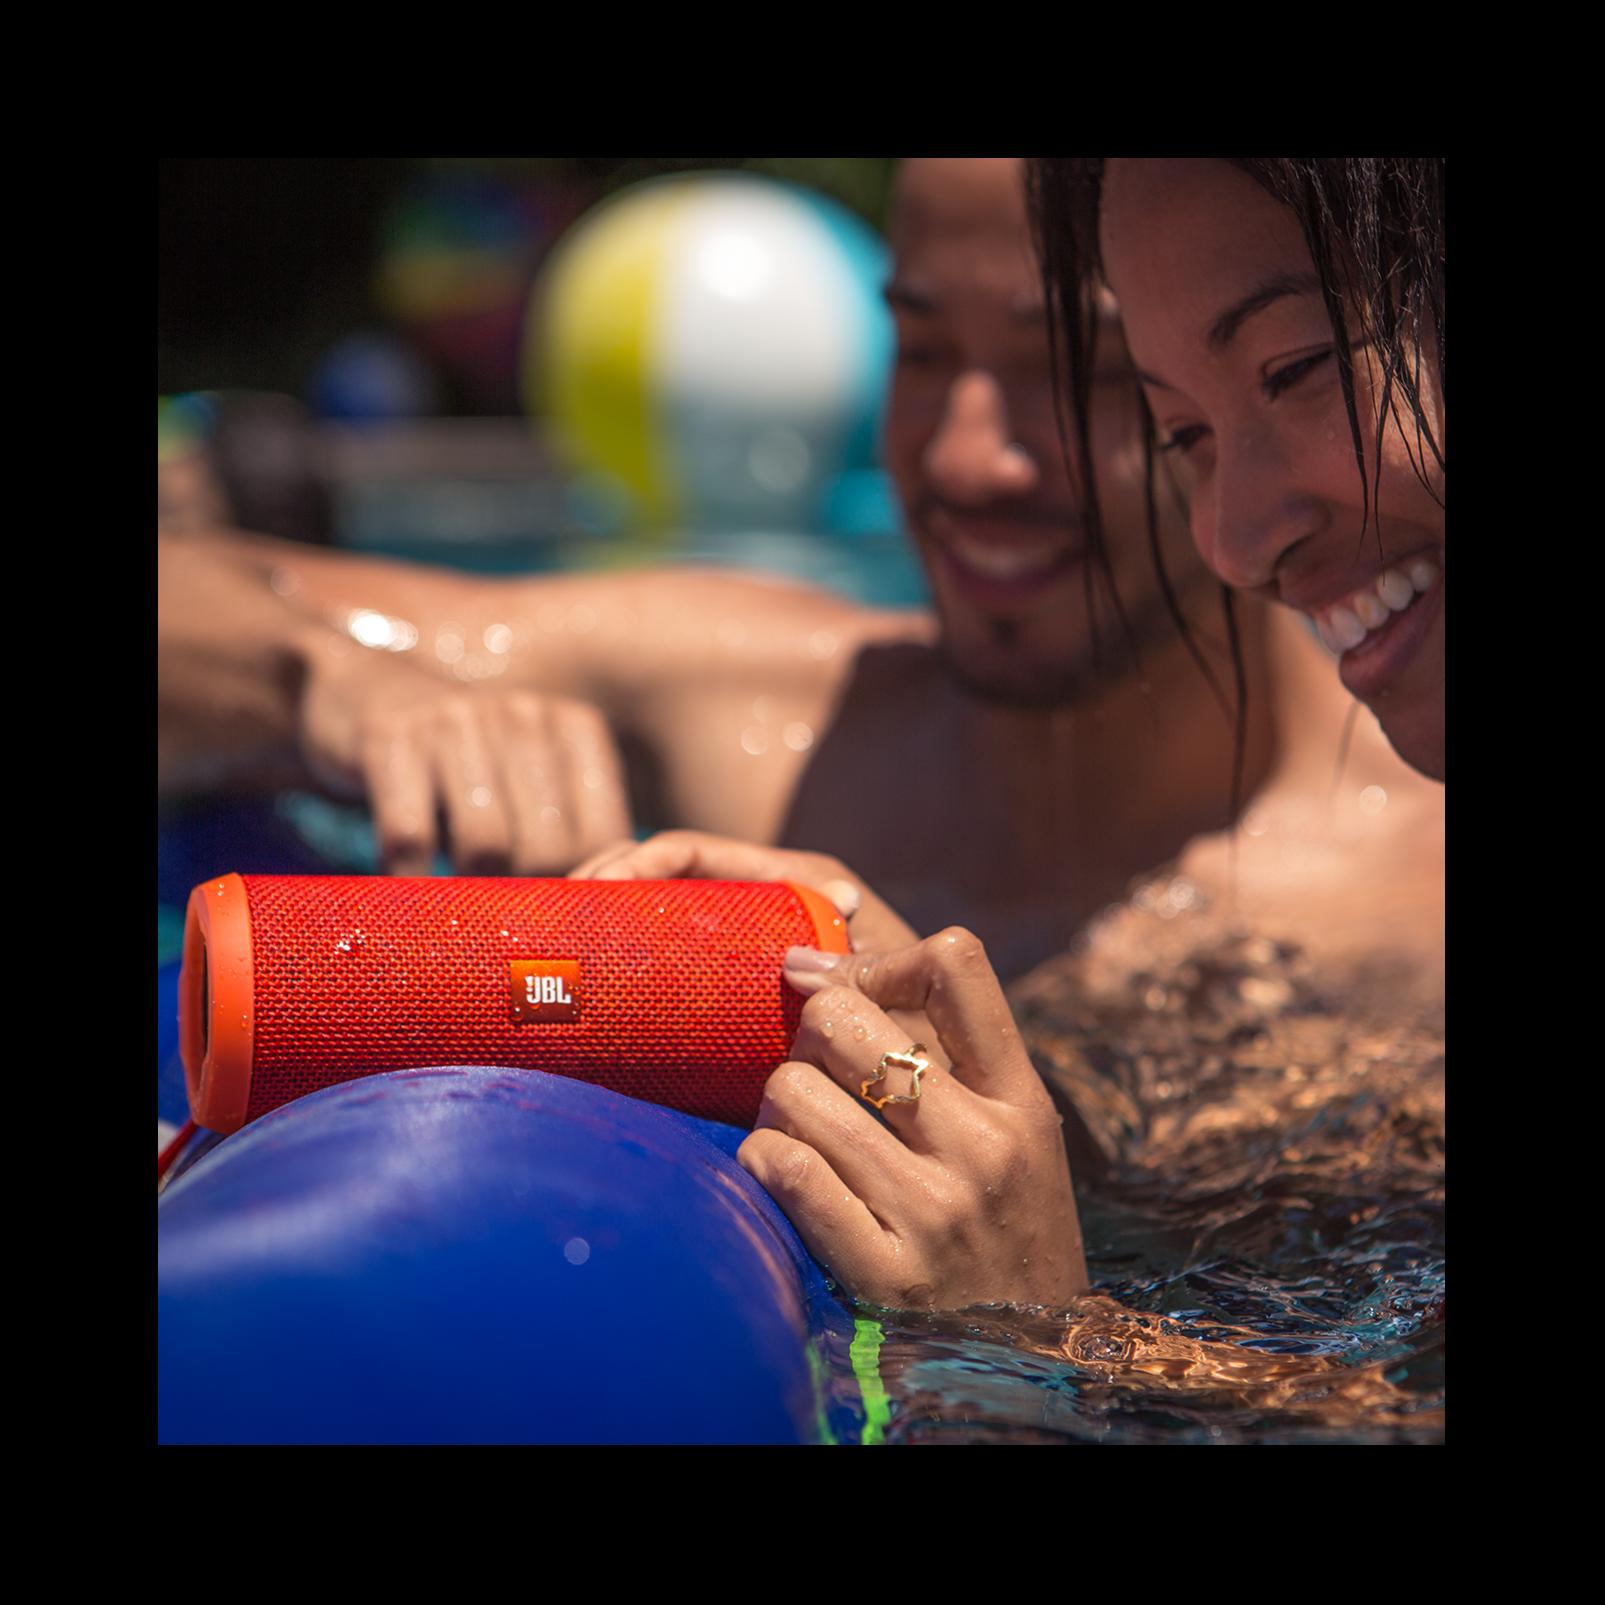 JBL Flip 3 - Blue - Splashproof portable Bluetooth speaker with powerful sound and speakerphone technology - Detailshot 6